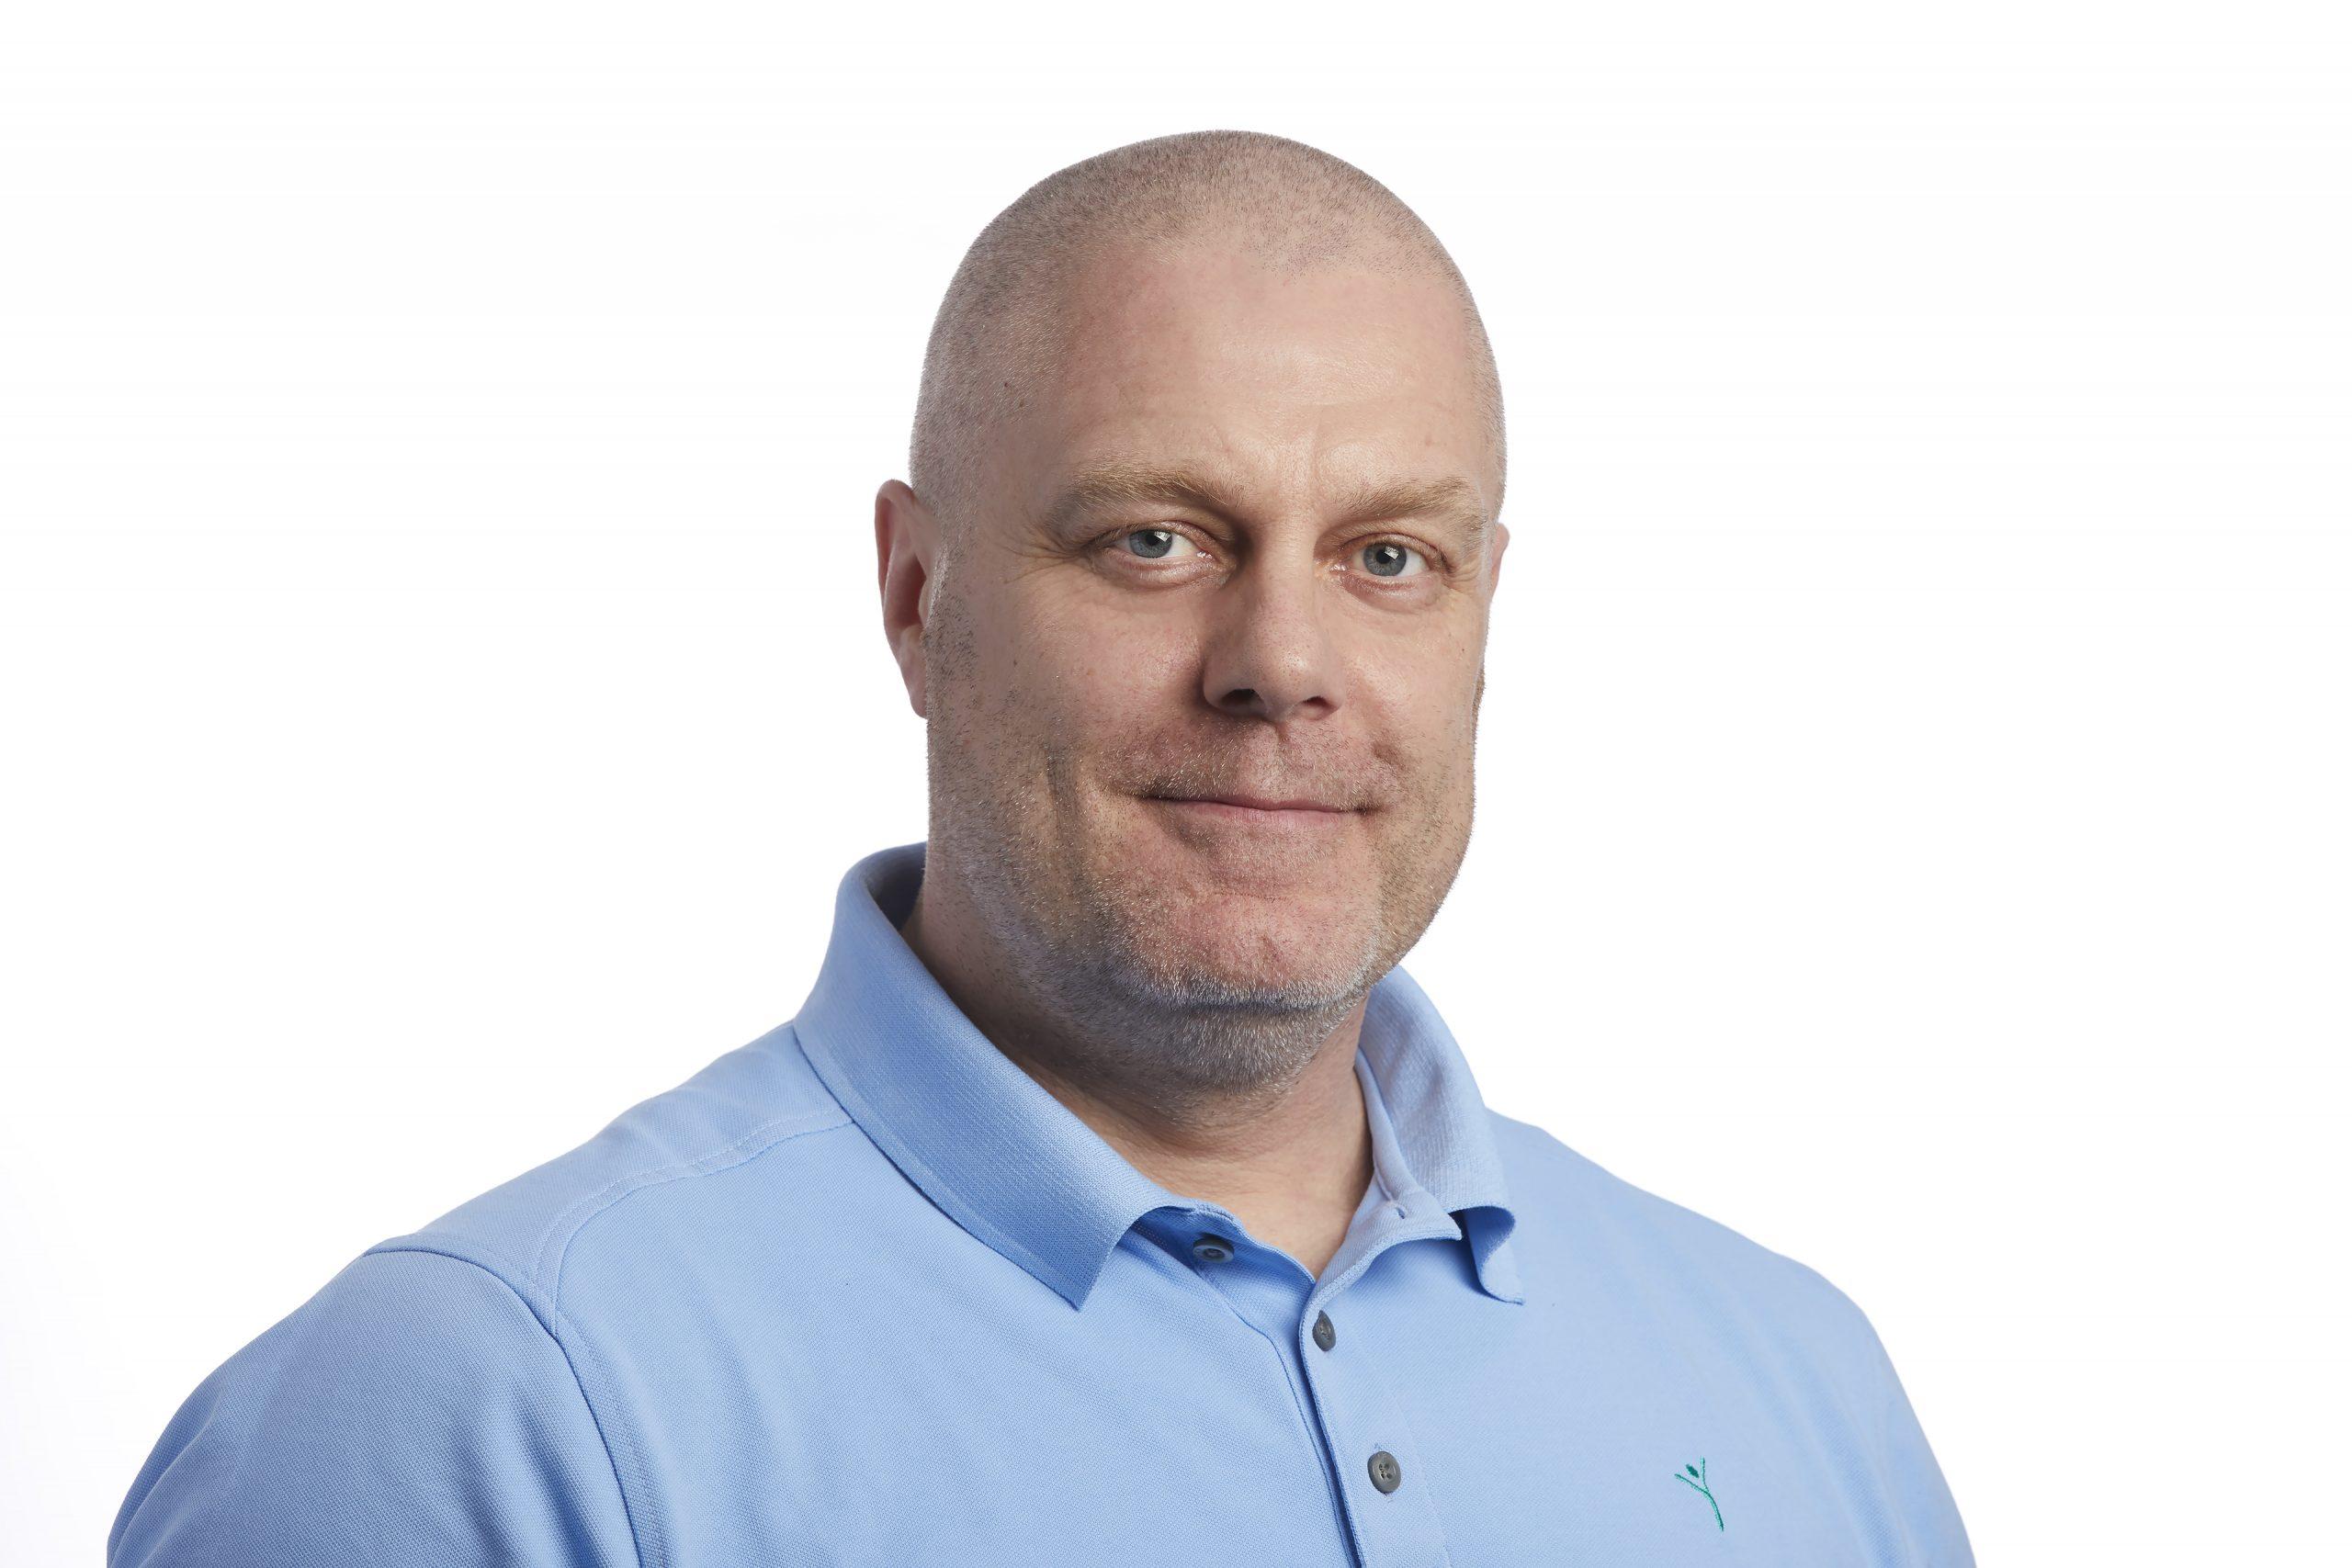 Lars Jessen